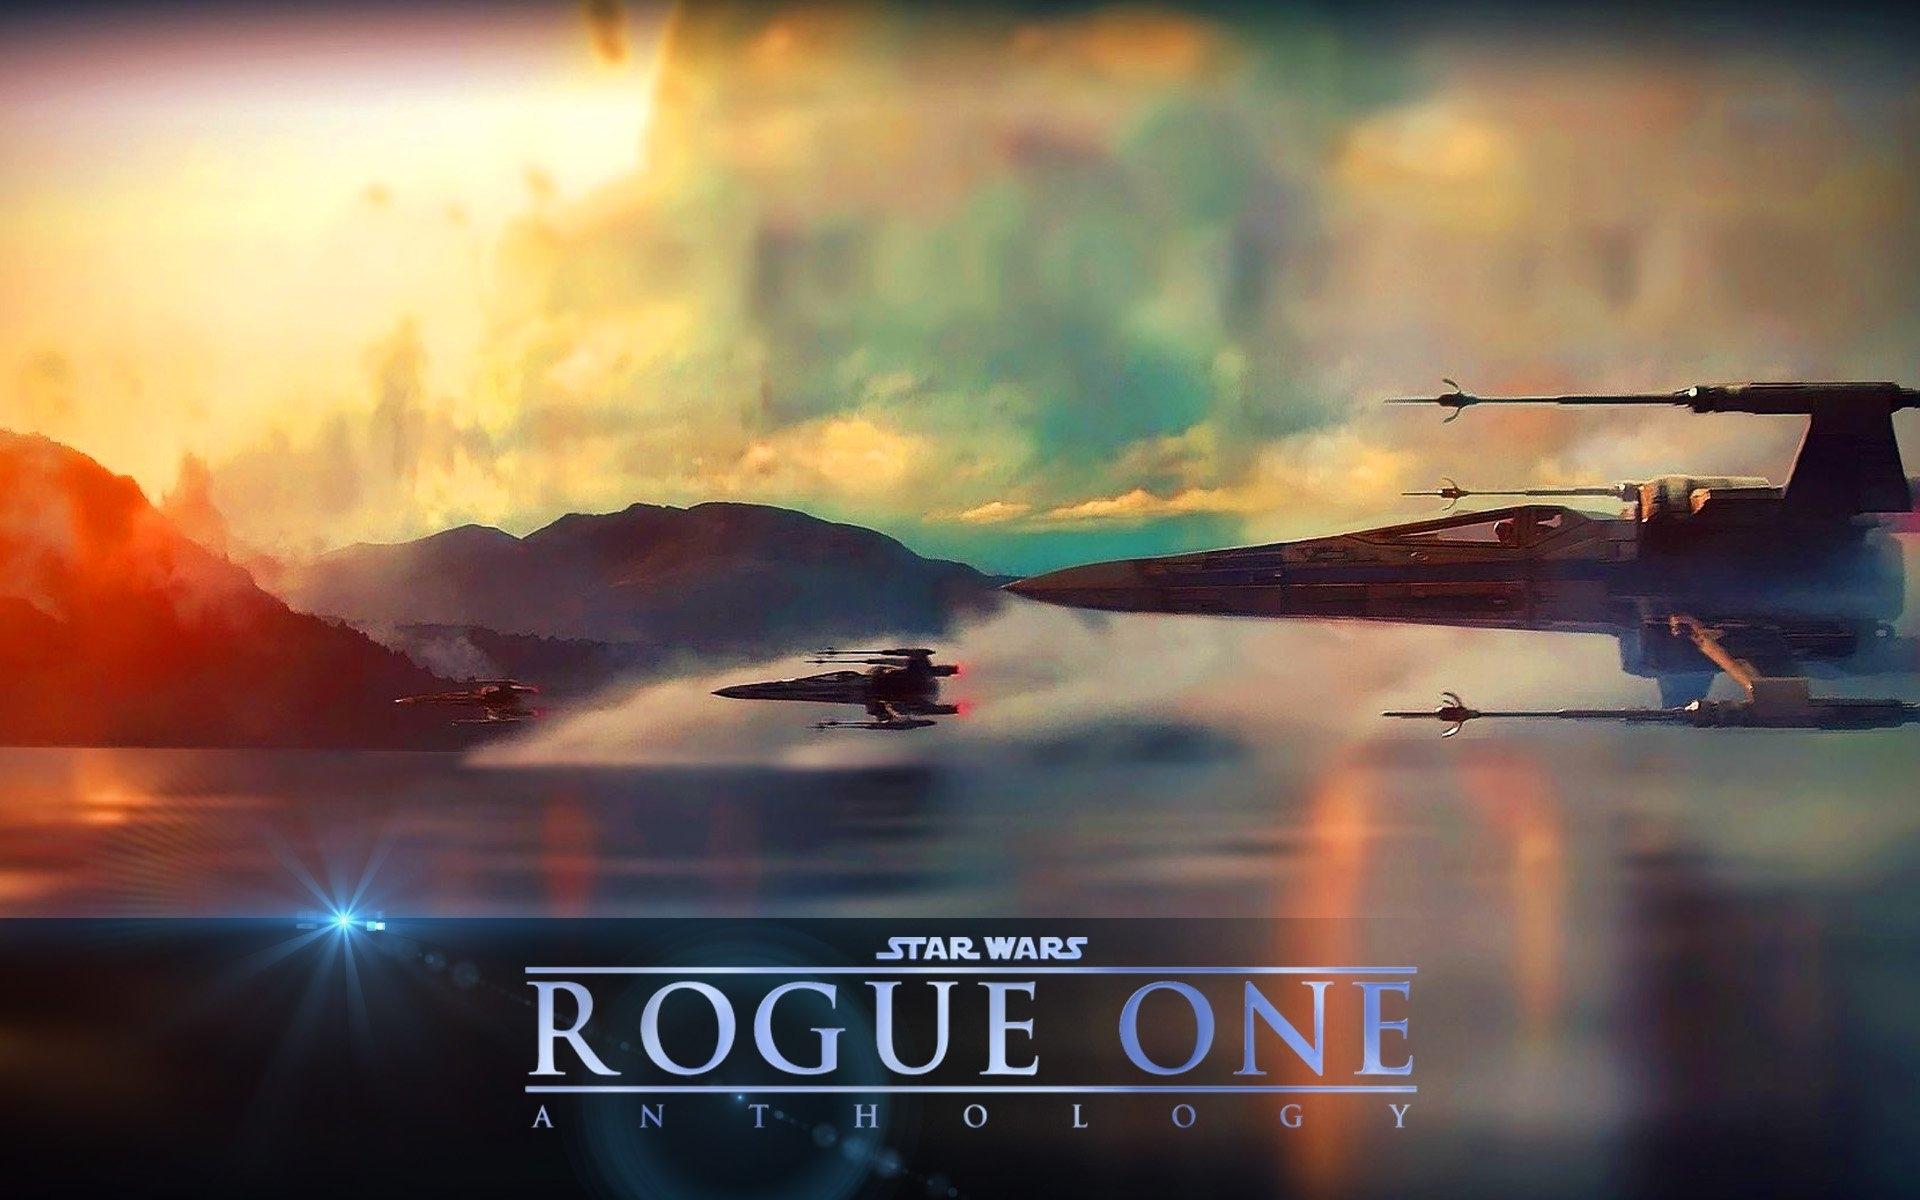 rogue one: a star wars story full hd fond d'écran and arrière-plan